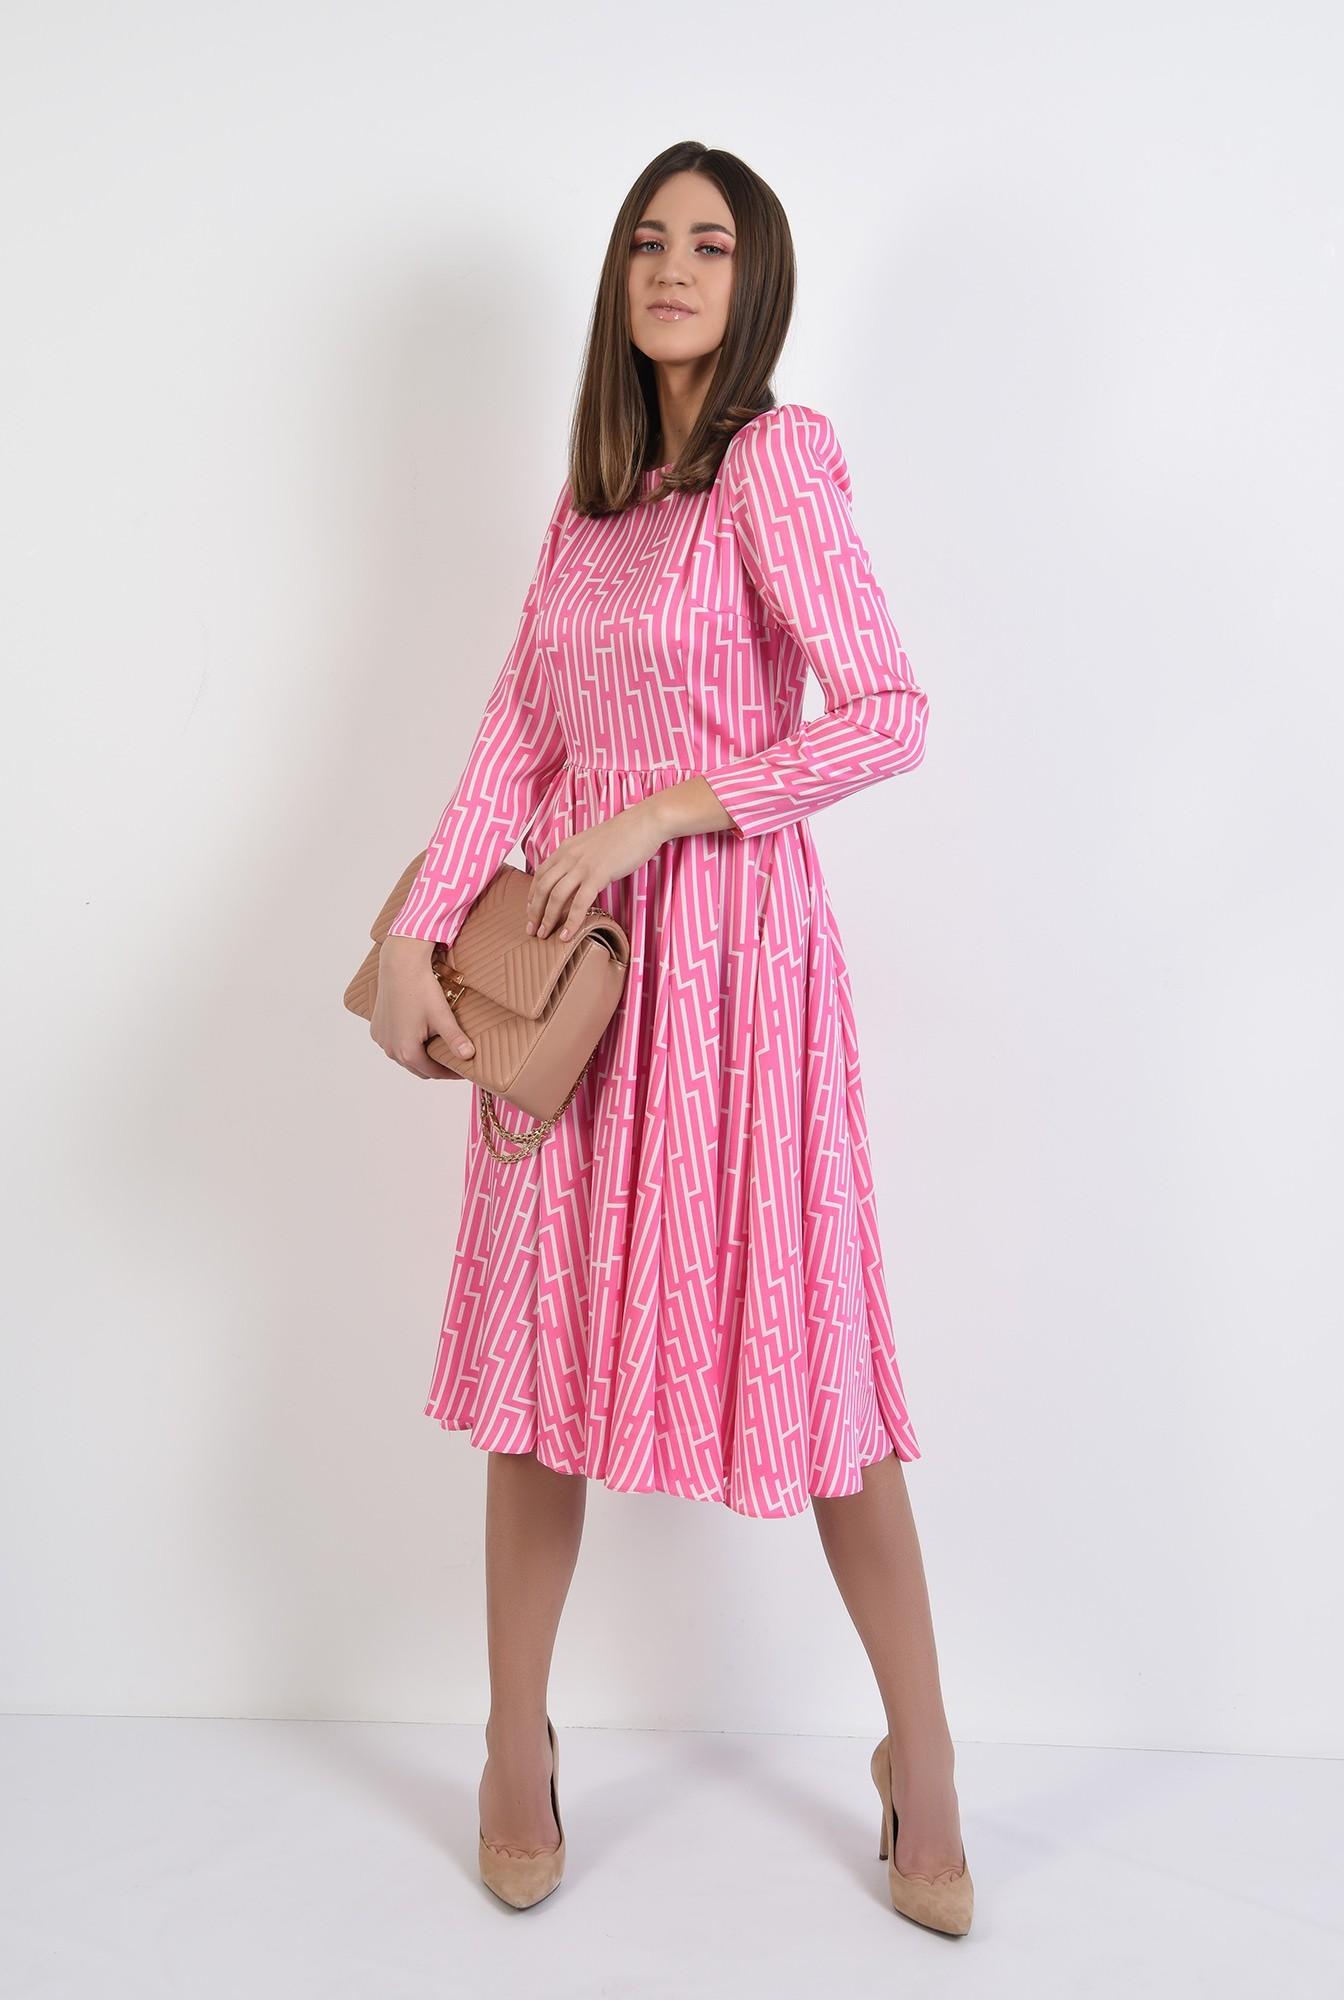 3 - rochie midi, evazata, cu motive geometrice, maneci lungi, roz